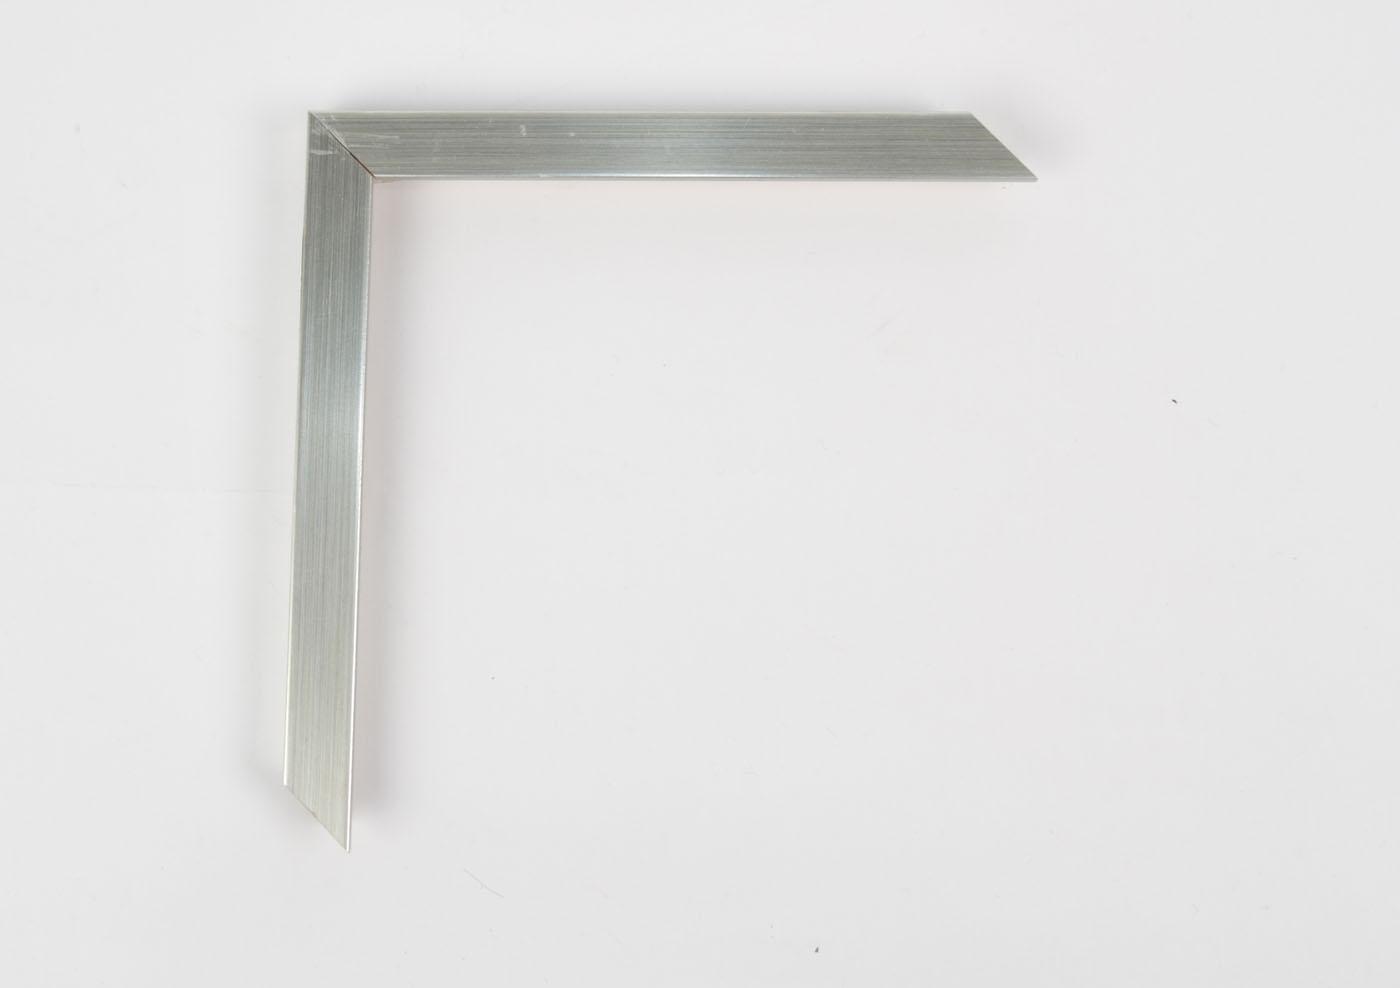 01717-665-ancho1,7cm